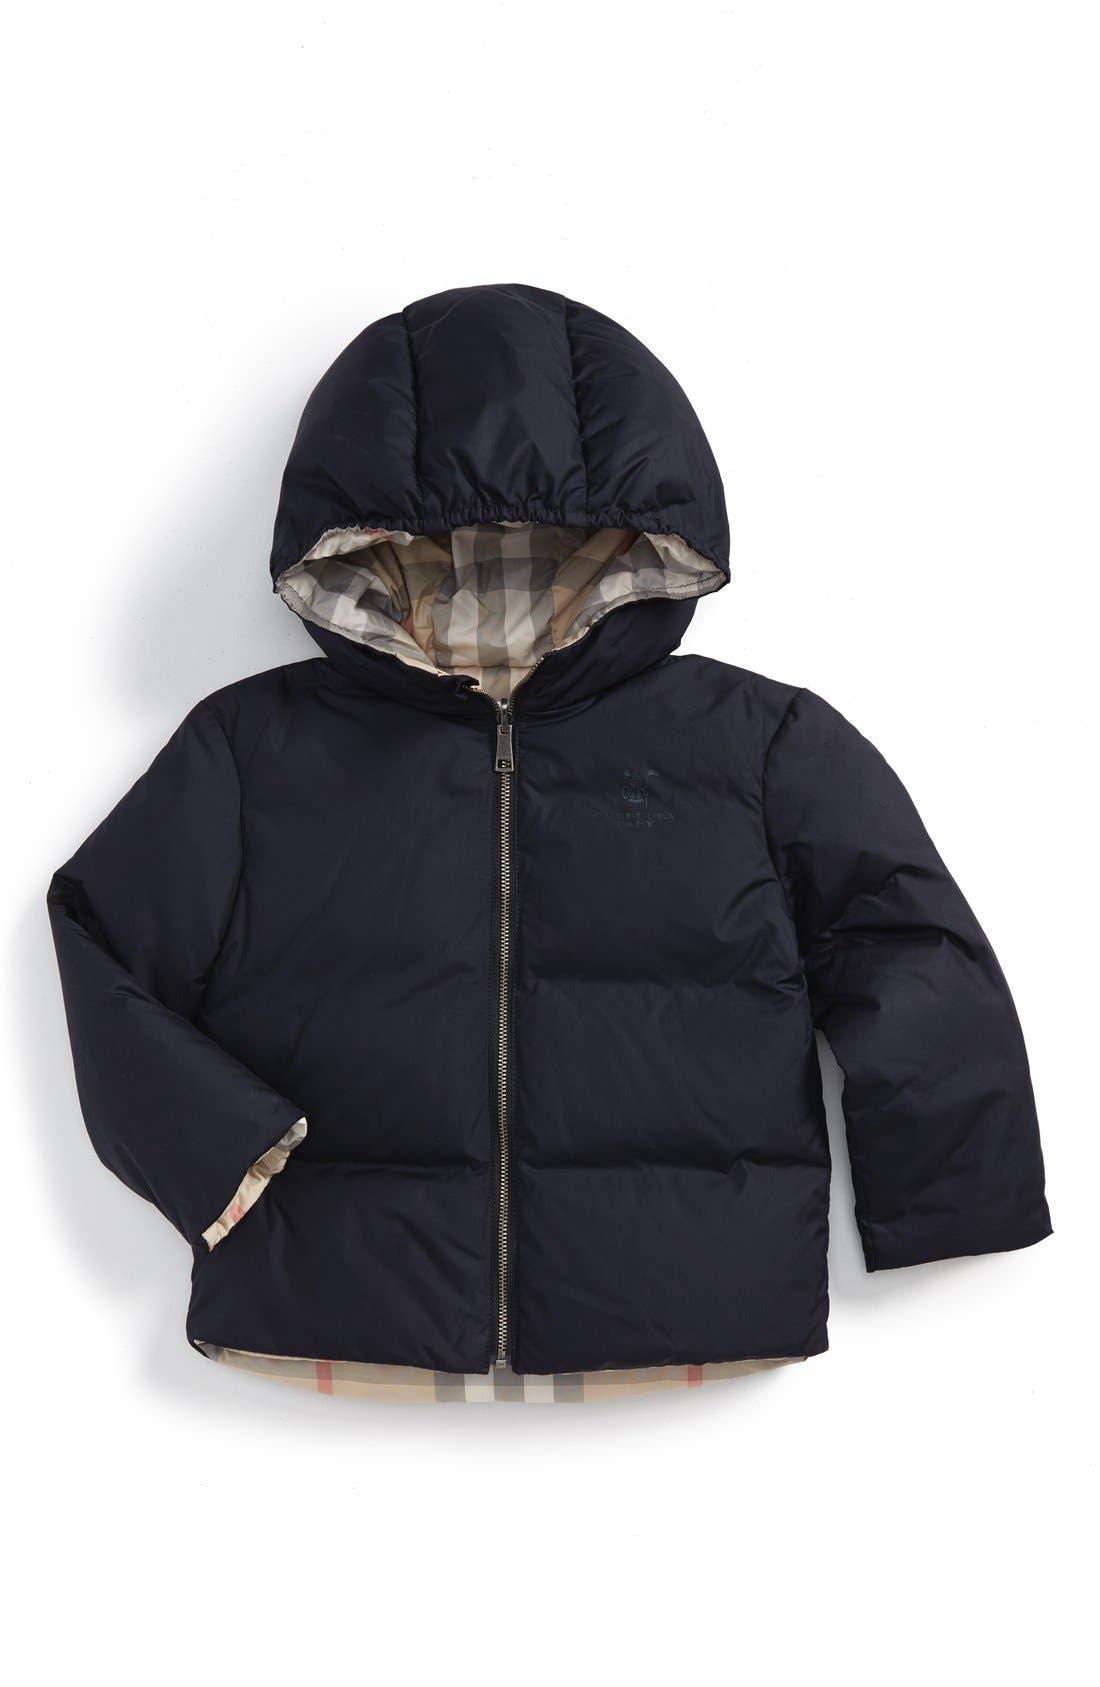 Burberry 'Rio' Hooded Puffer Jacket (Toddler Girls)